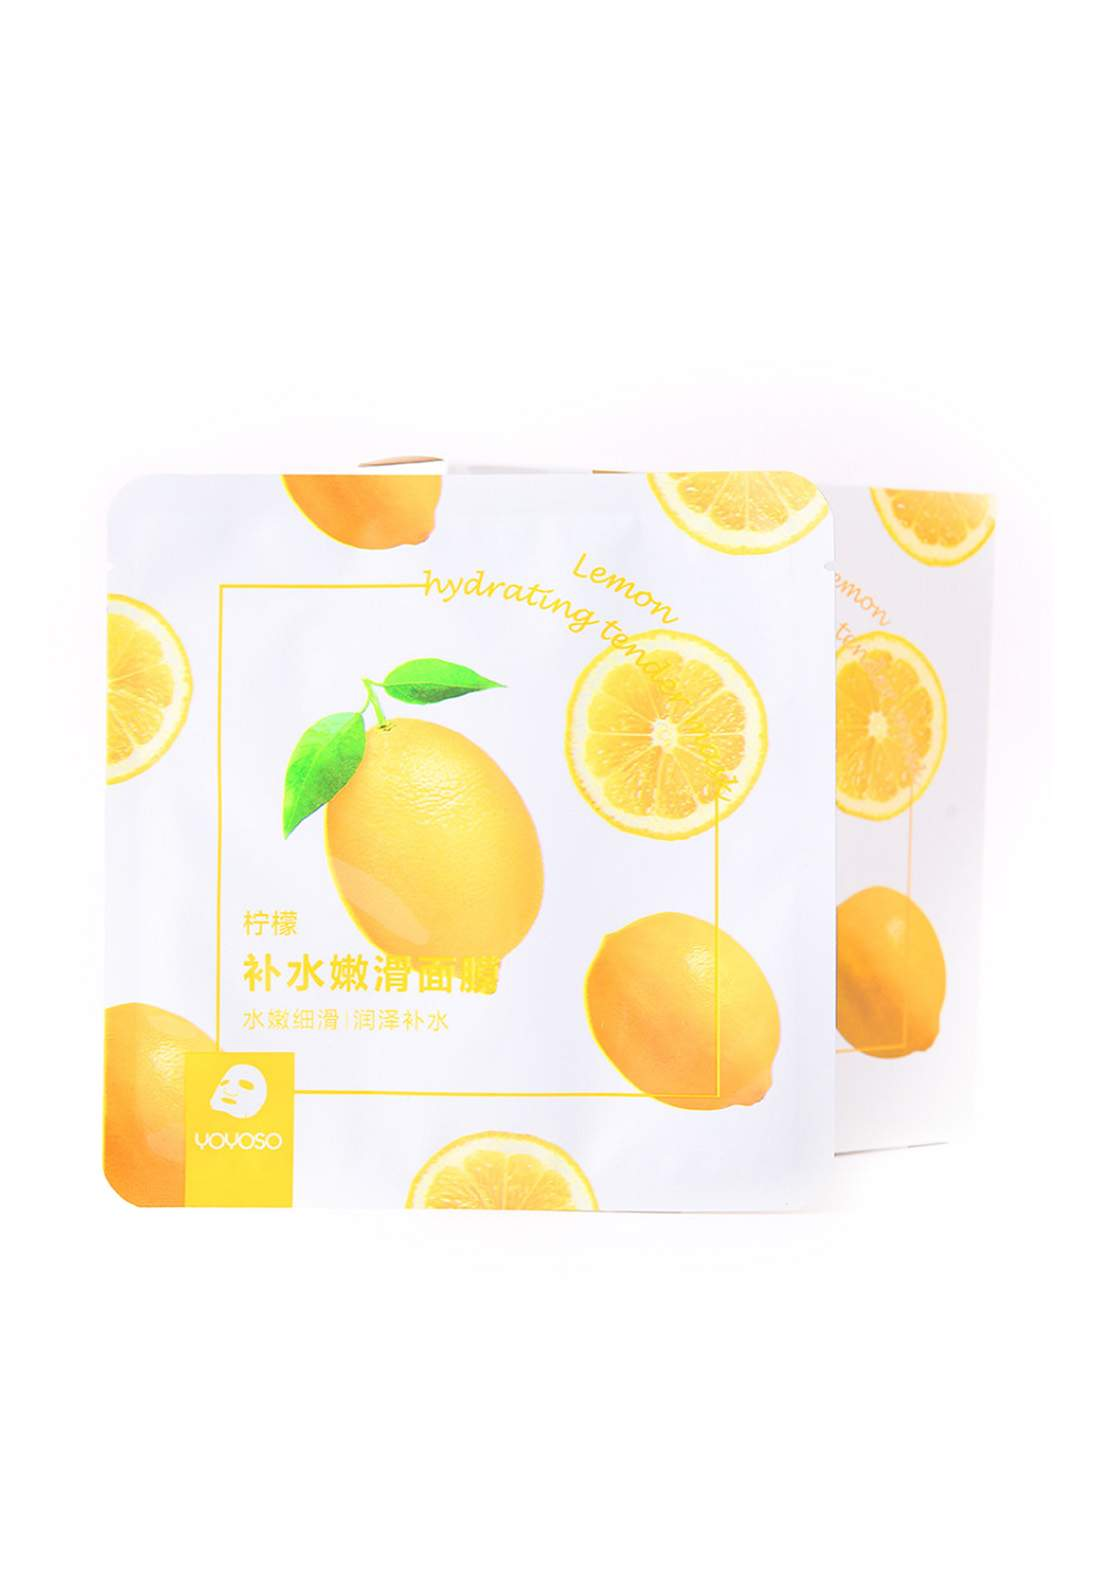 Yoyo So Lemon Mask Hydrating Tender Mask ماسك للوجه